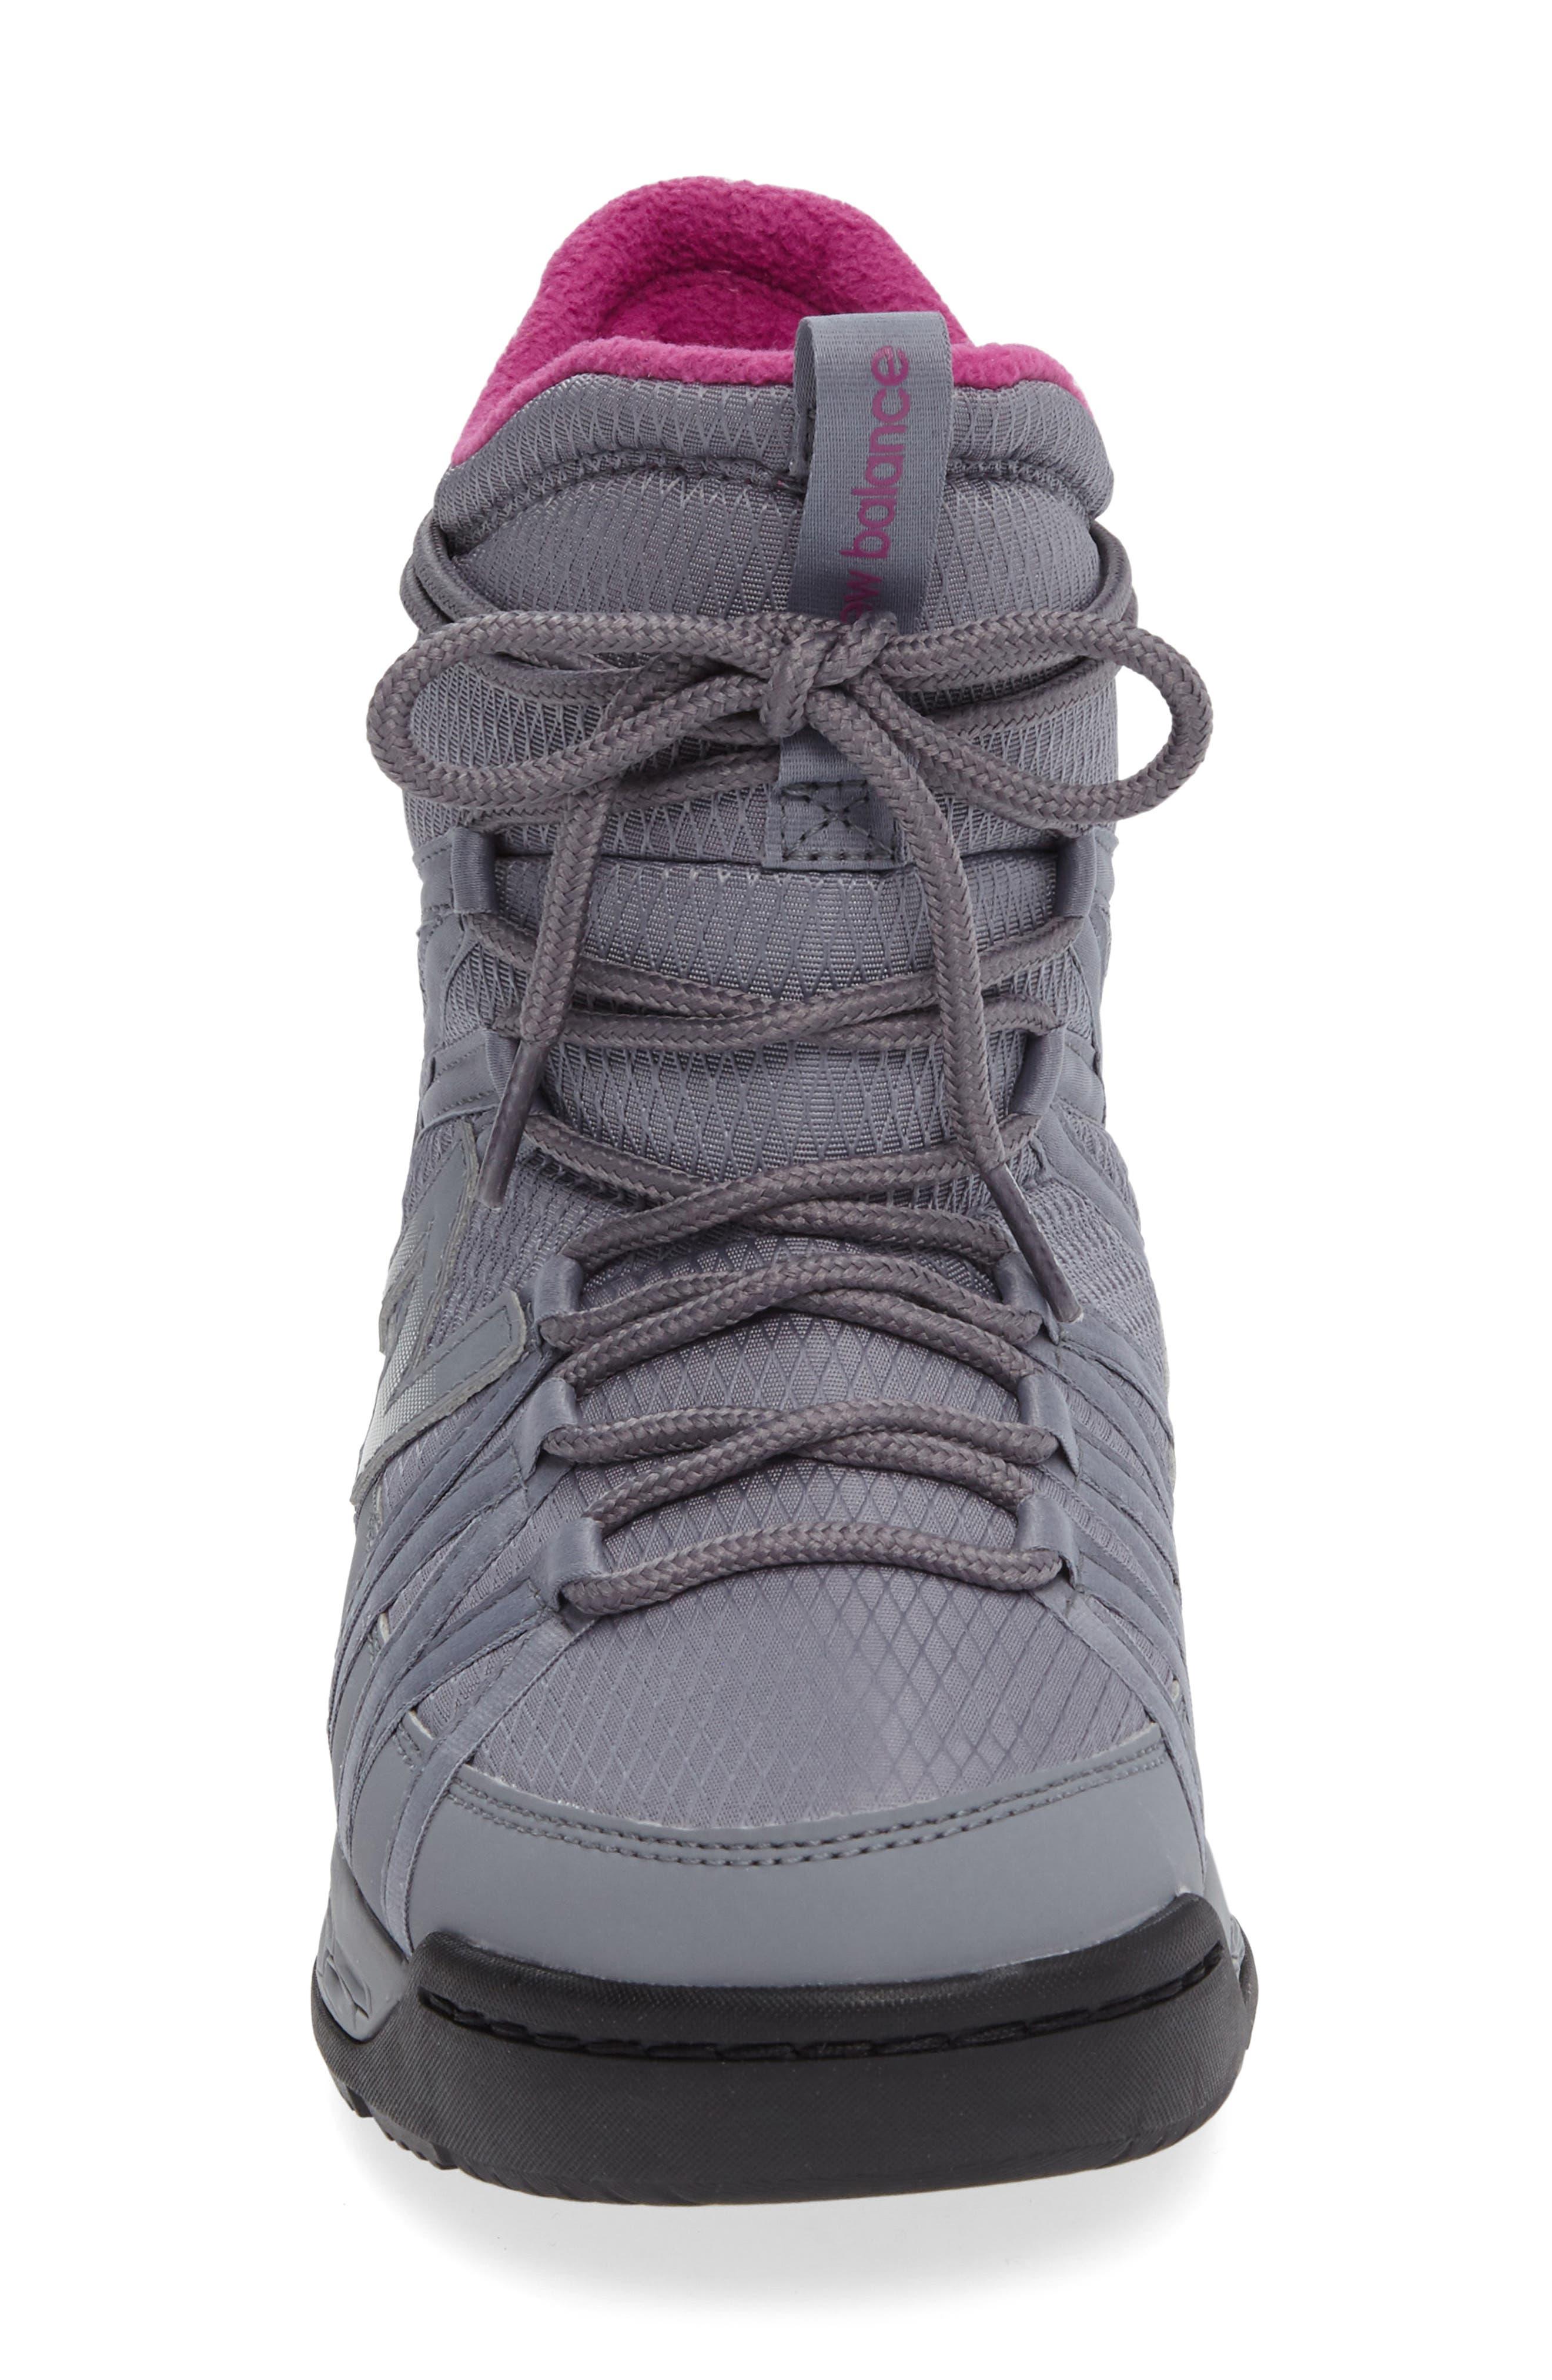 Q416 Weatherproof Snow Boot,                             Alternate thumbnail 11, color,